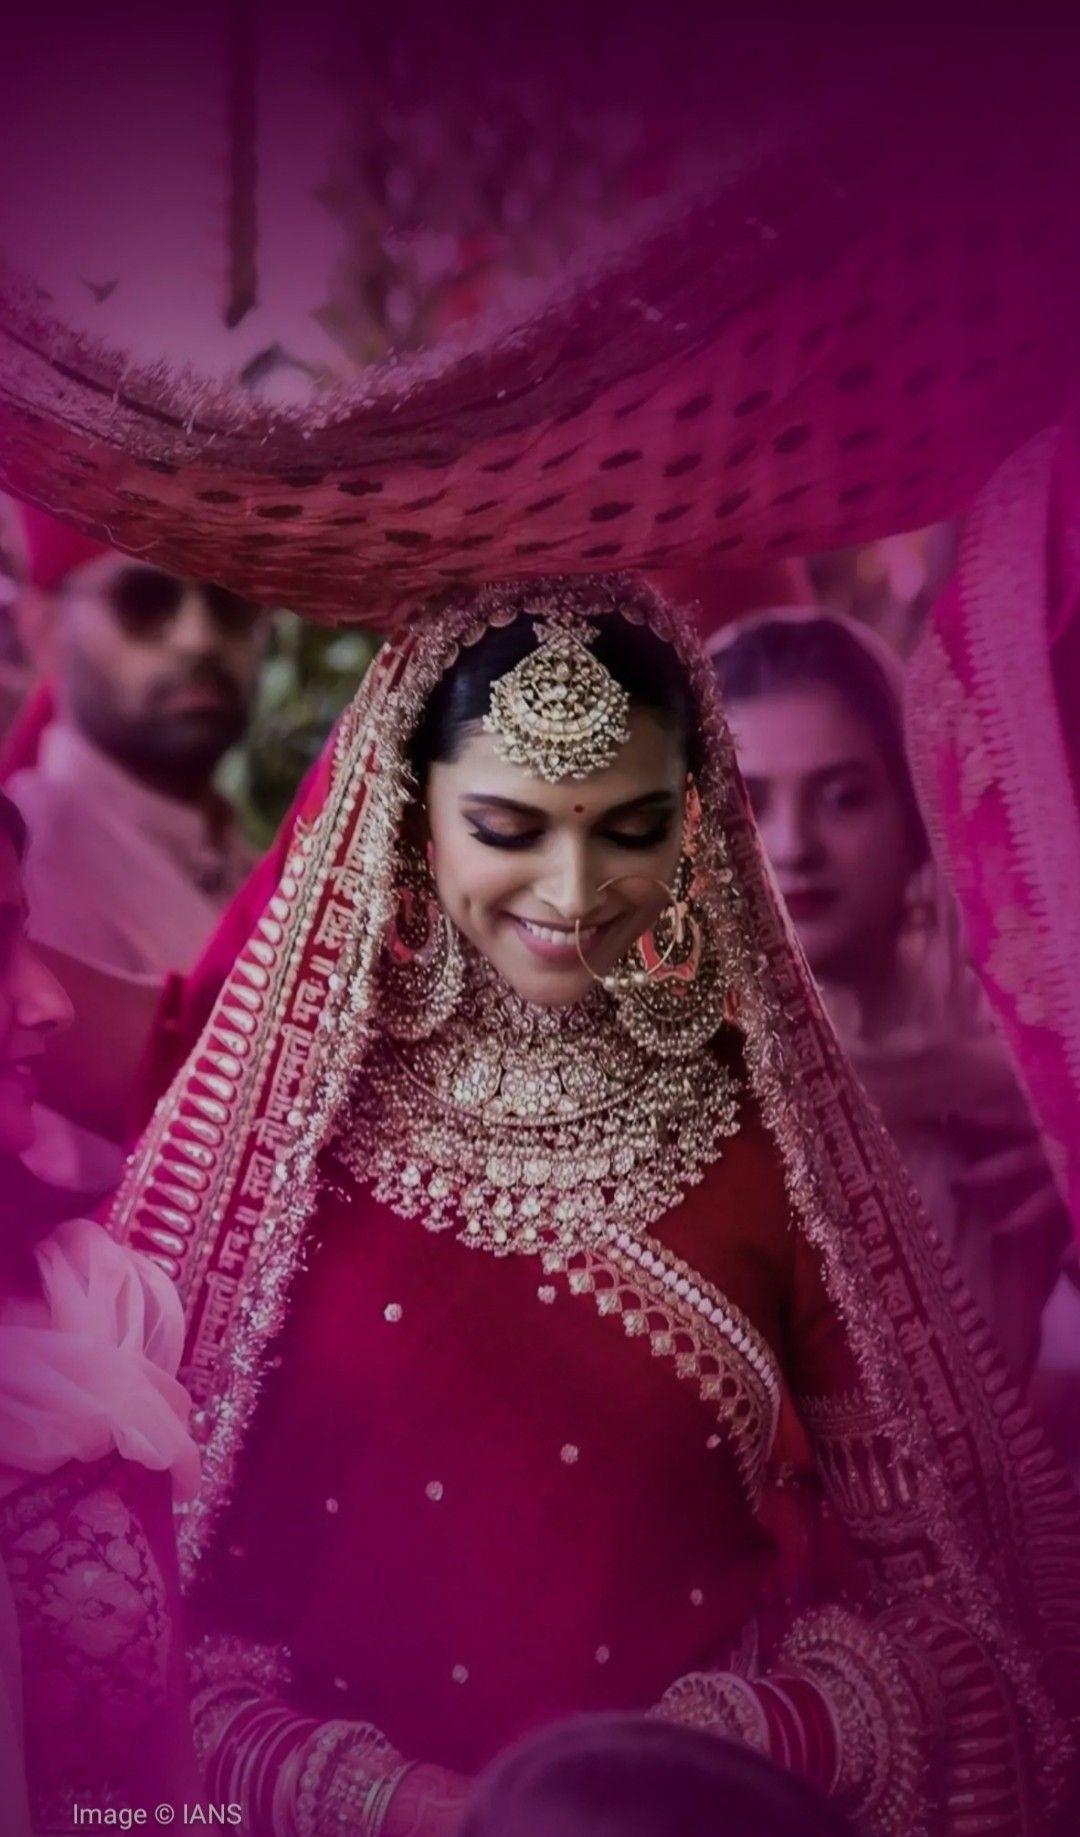 Pin by Shreya Kumar on Deepika padukone | Indian bridal ...